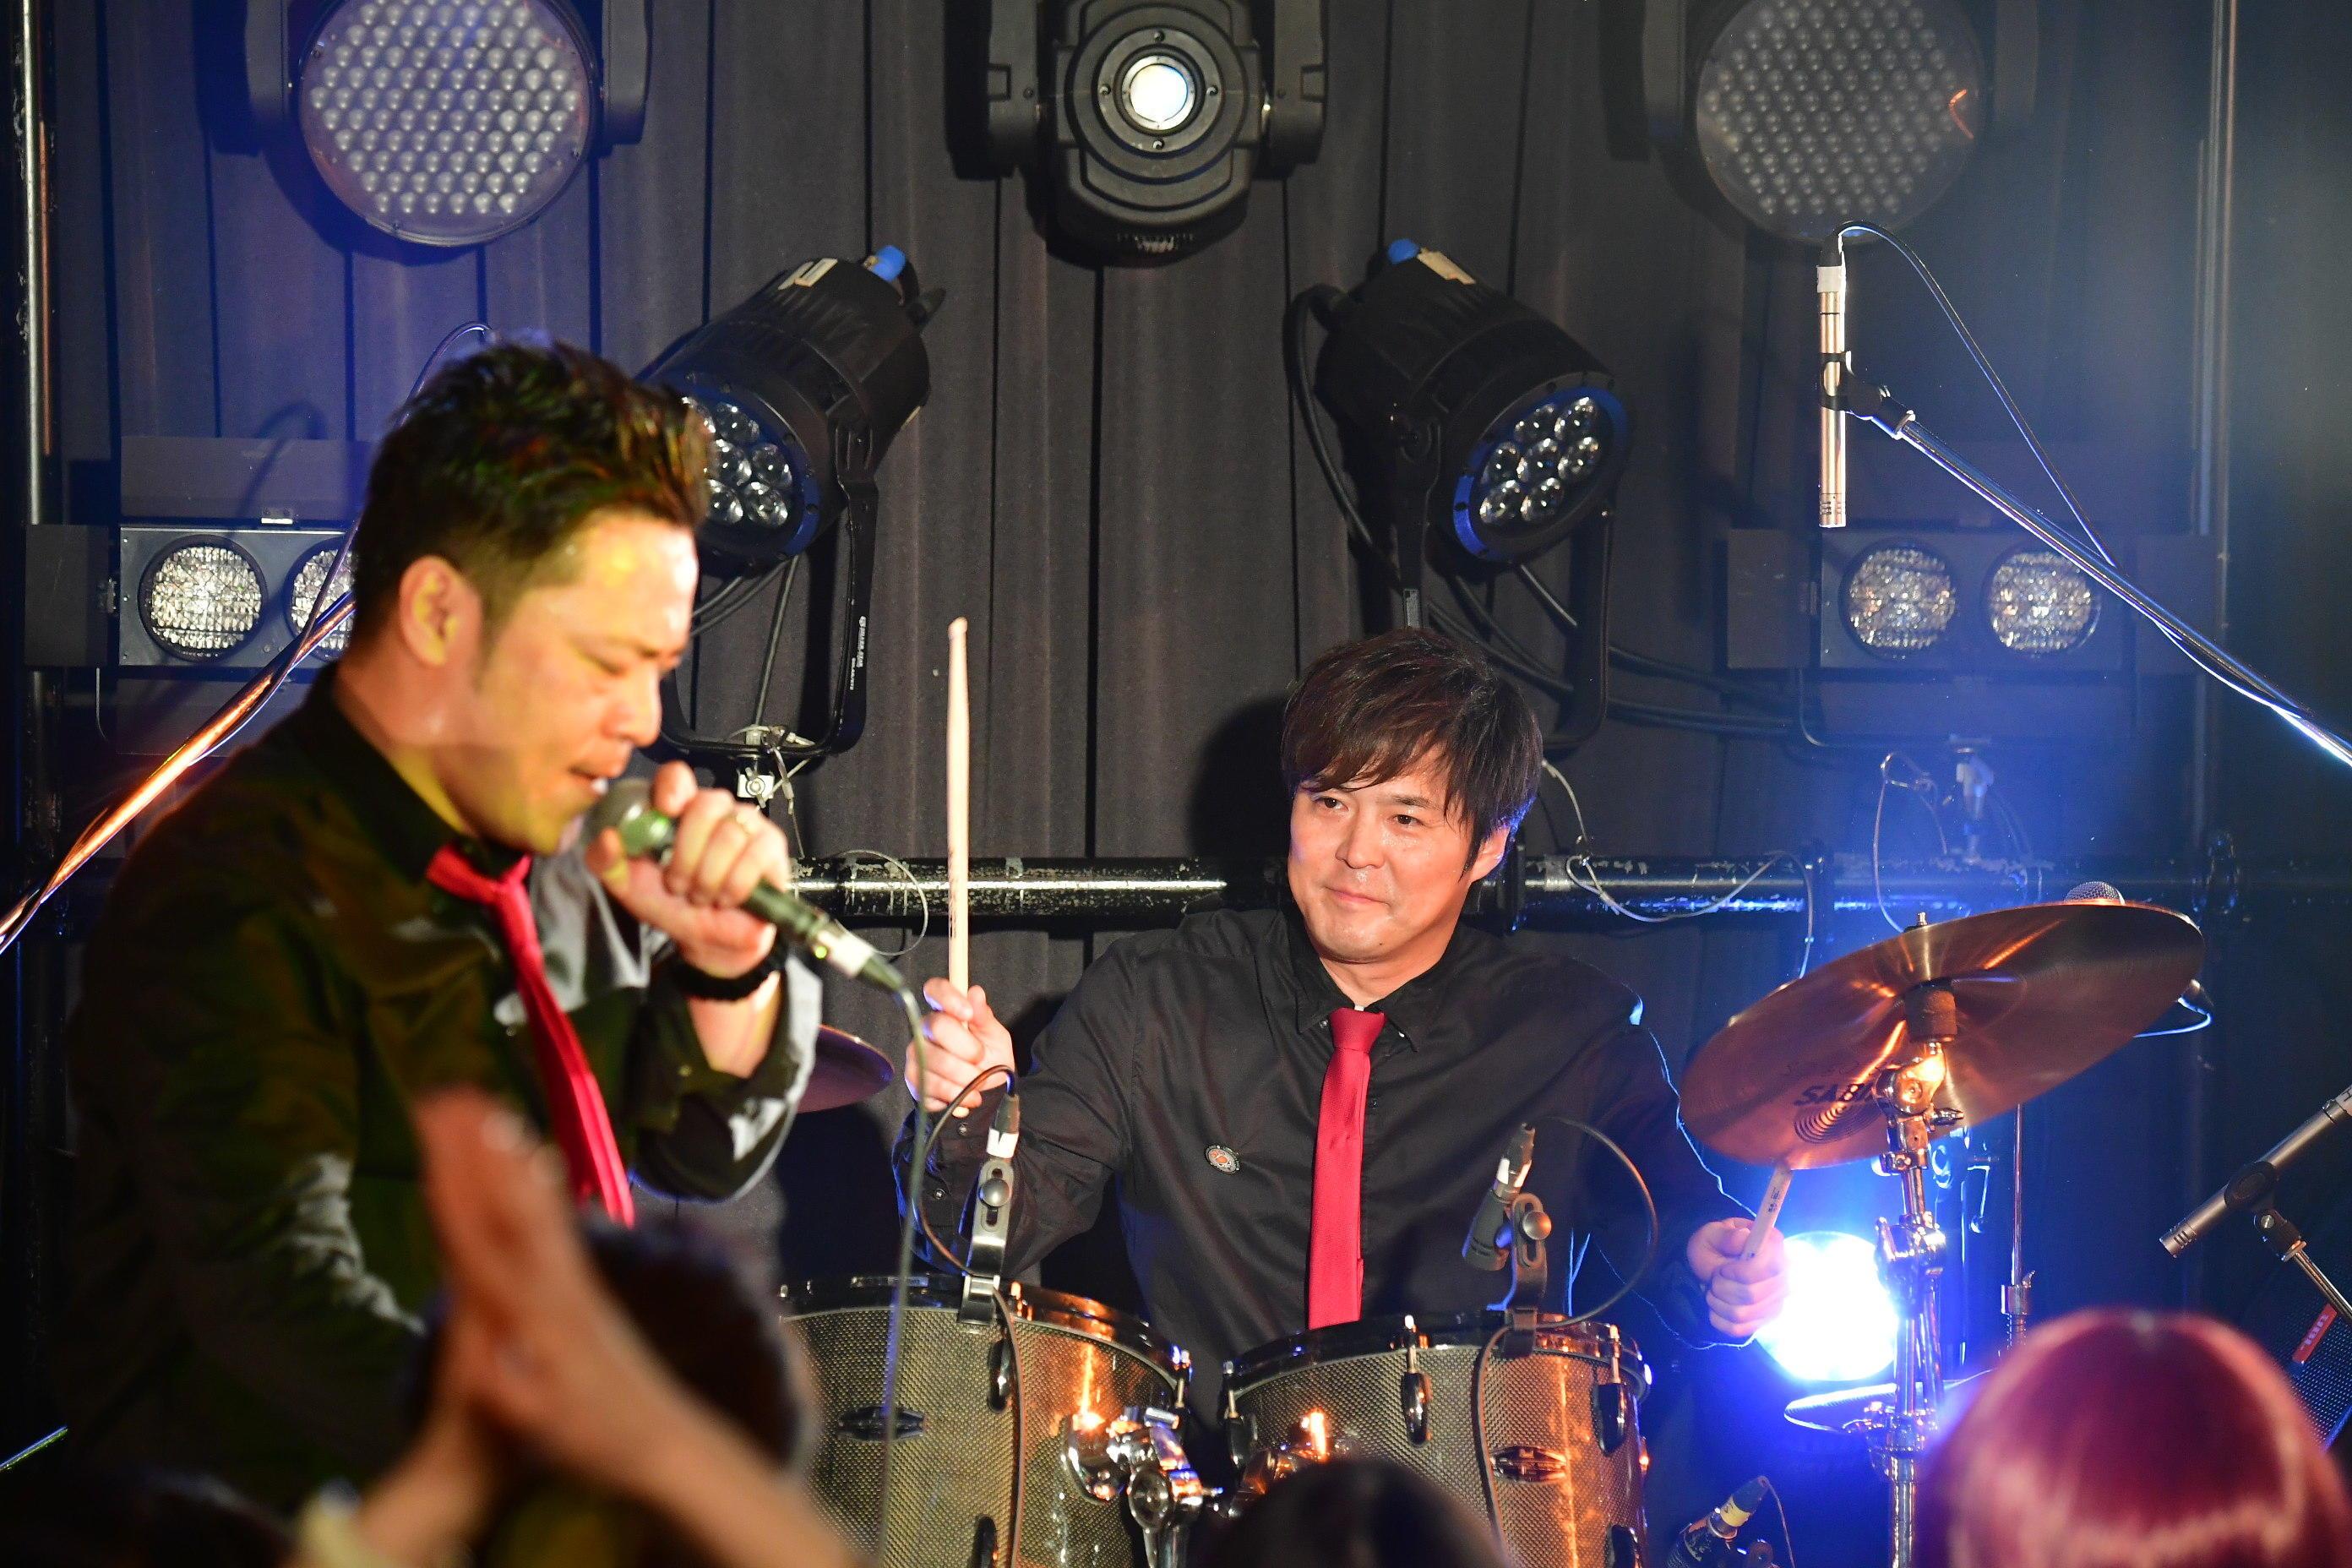 http://news.yoshimoto.co.jp/20180331130038-9c5b773e31b675427755abc0caee9de1c5eac96a.jpg